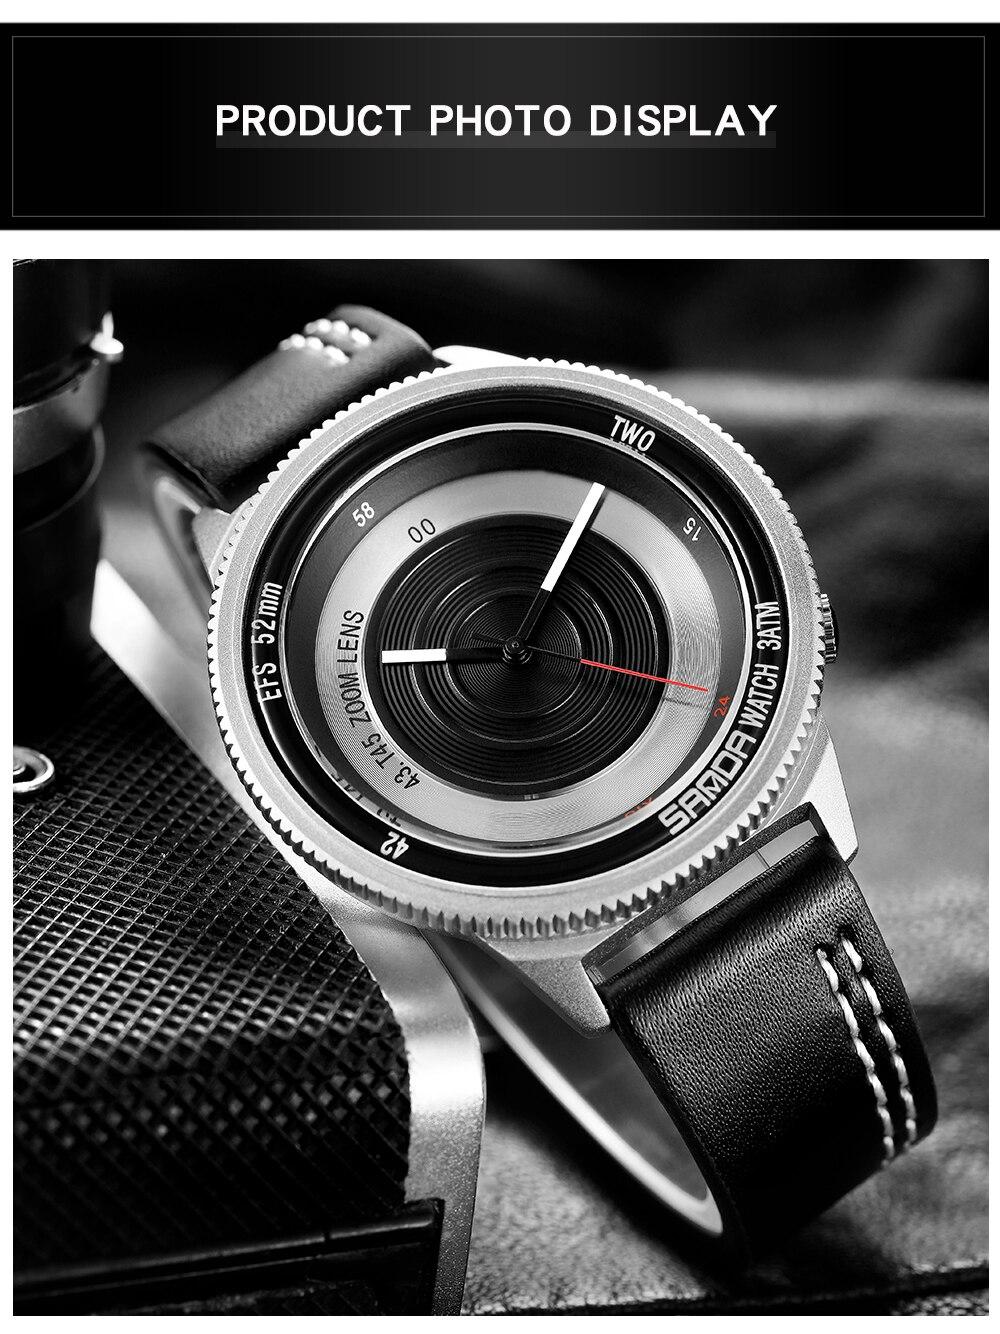 SANDA Creative Wristwatch for Men 5 ATM Waterproof Watches Leather Strap Luxury Brand Clock Male Relogio Masculine